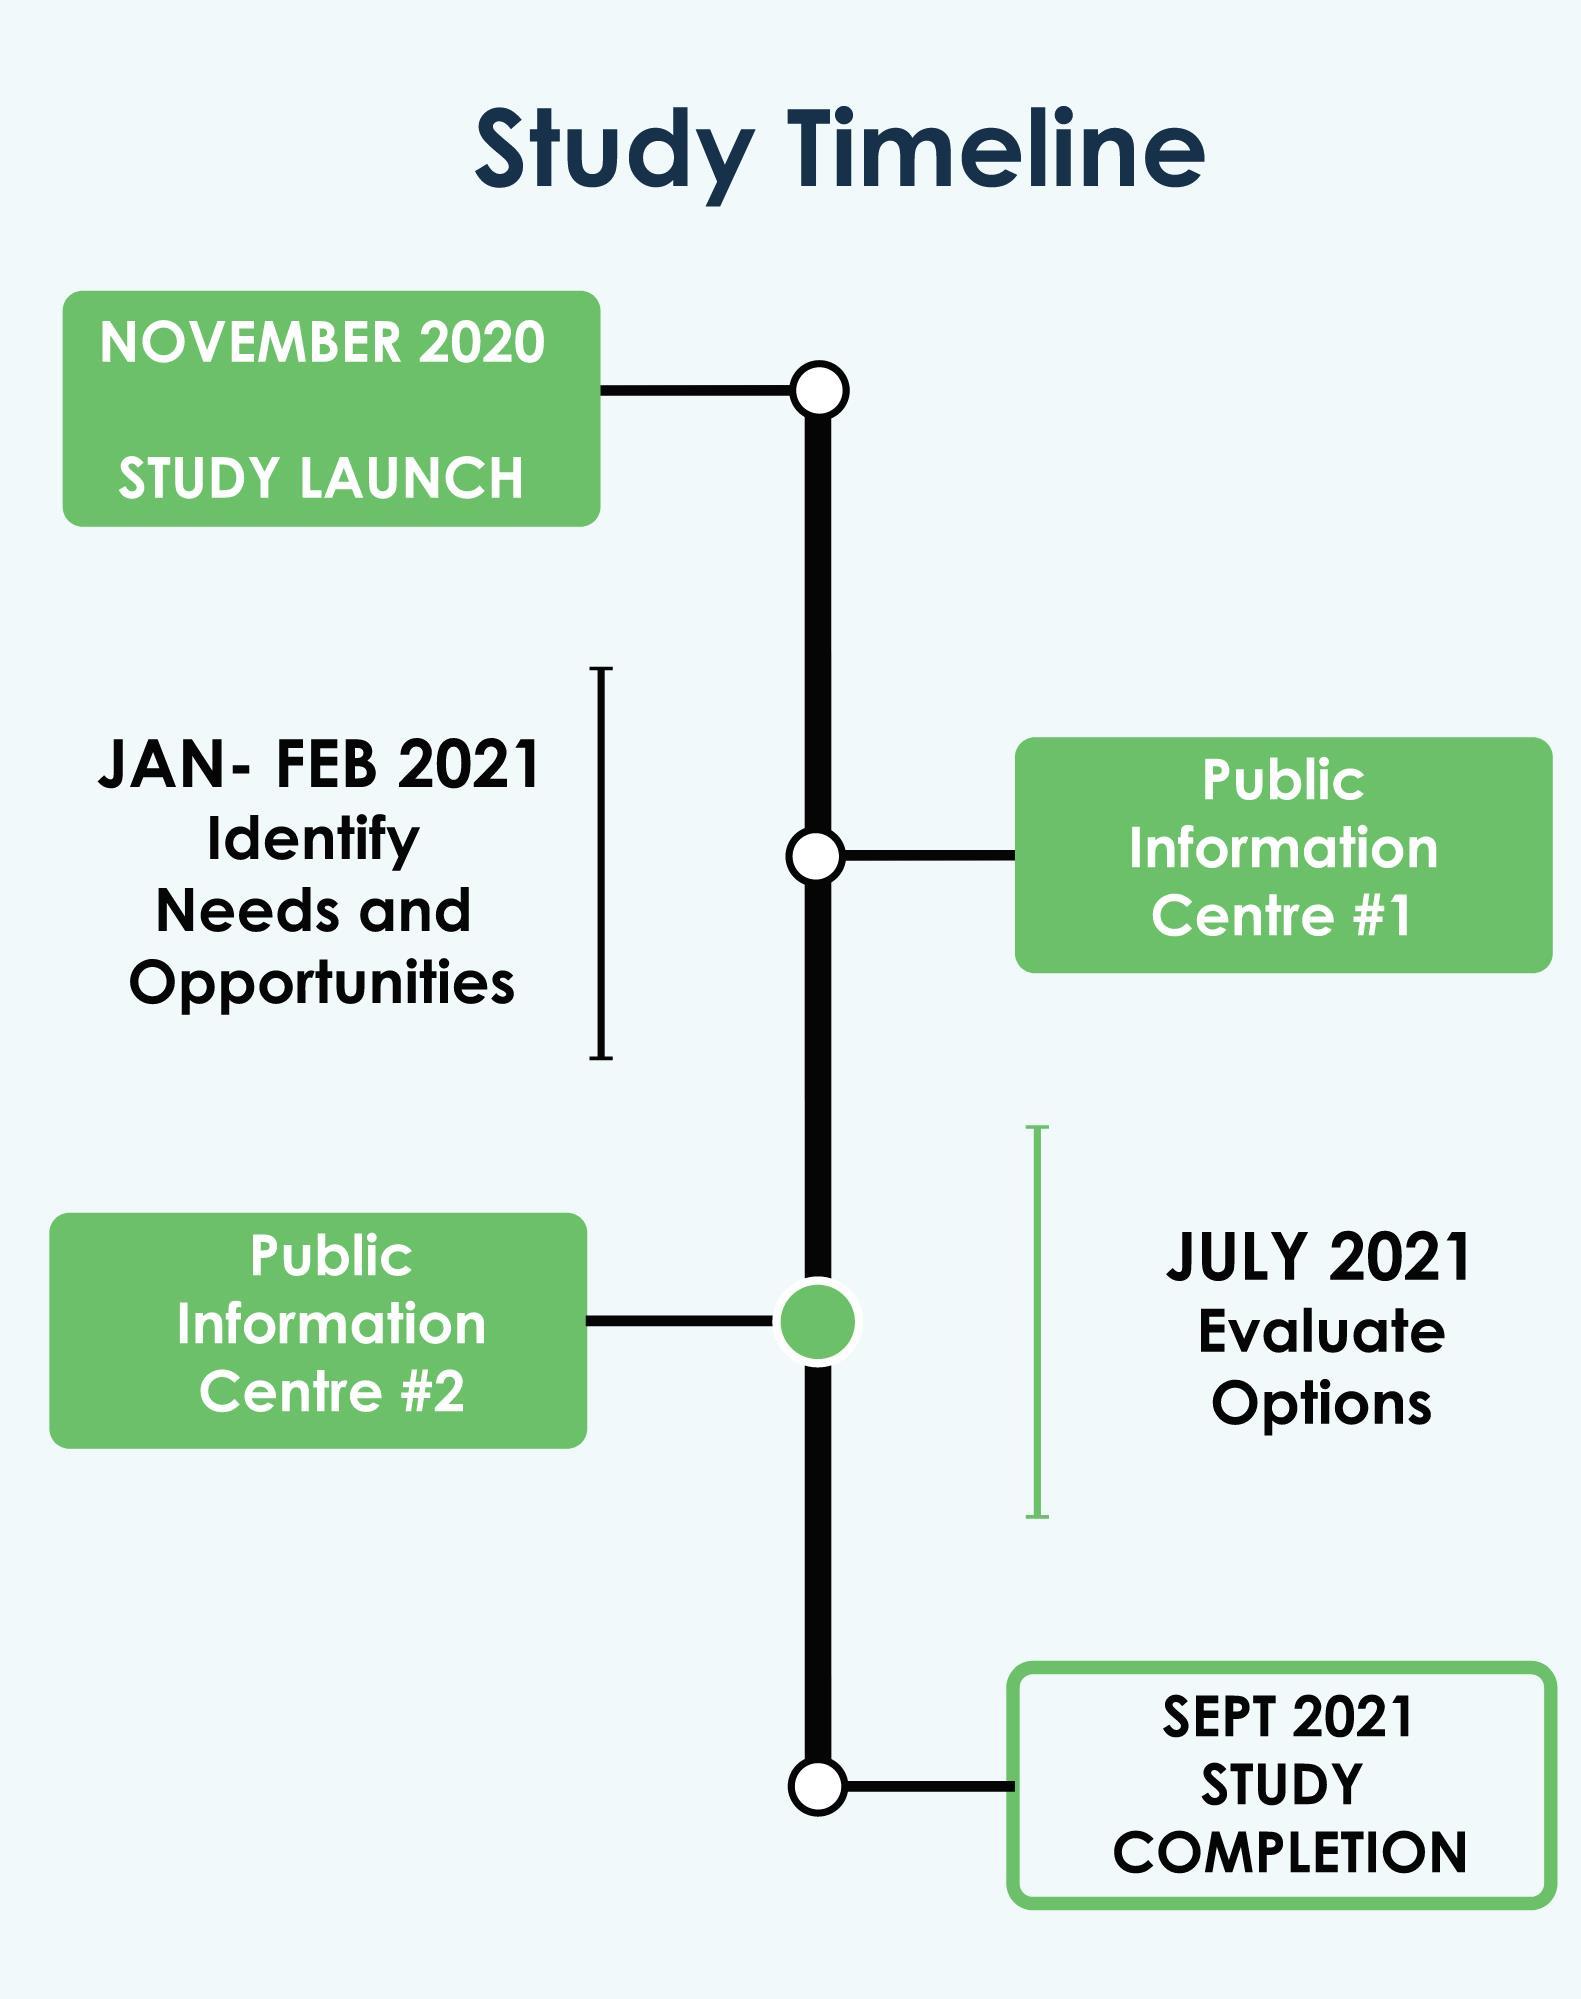 Study Timeline Image